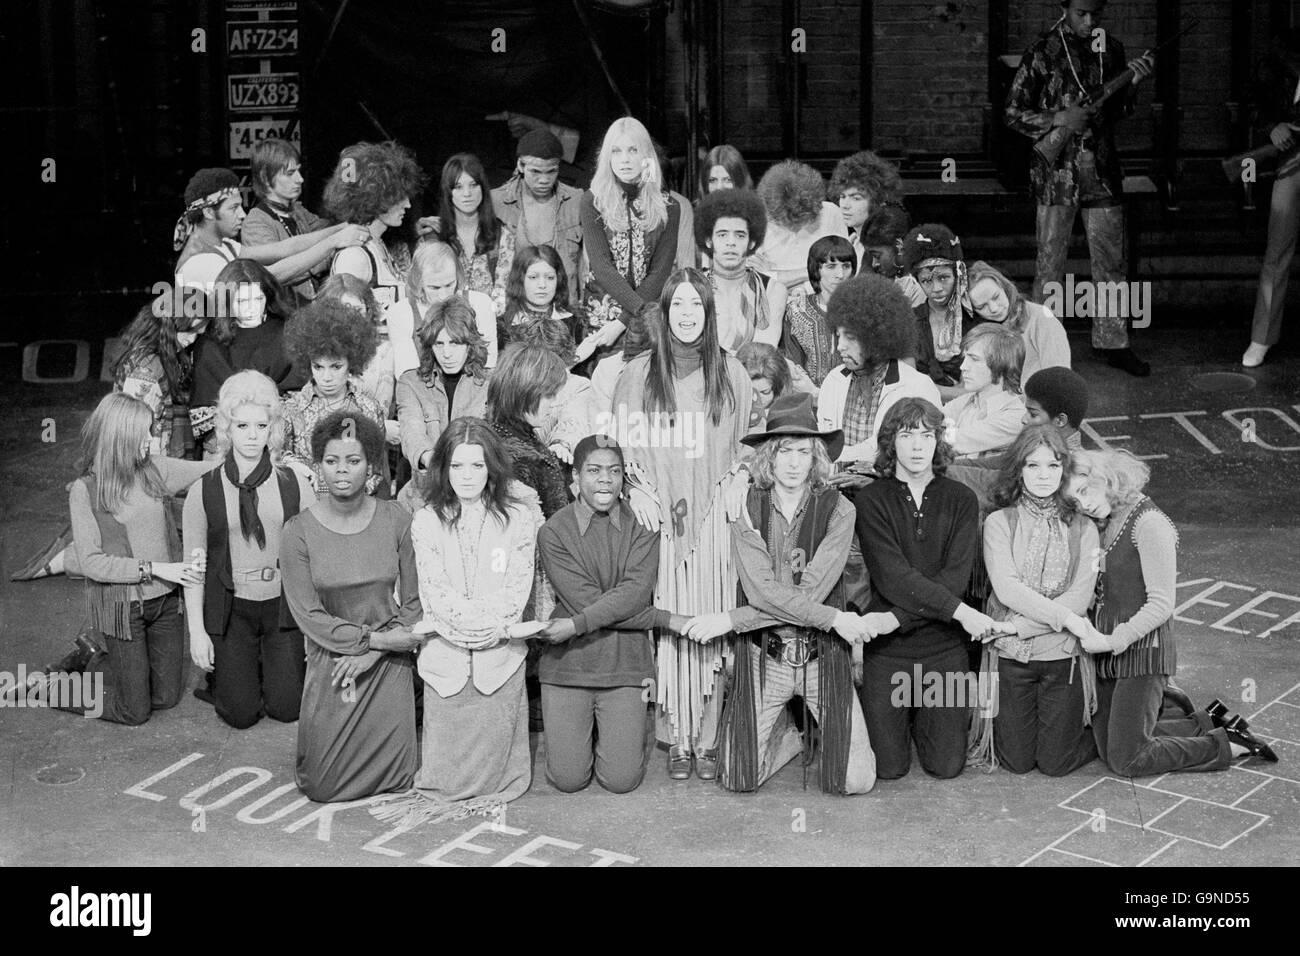 'Hair' - Shaftesbury Theatre - Stock Image